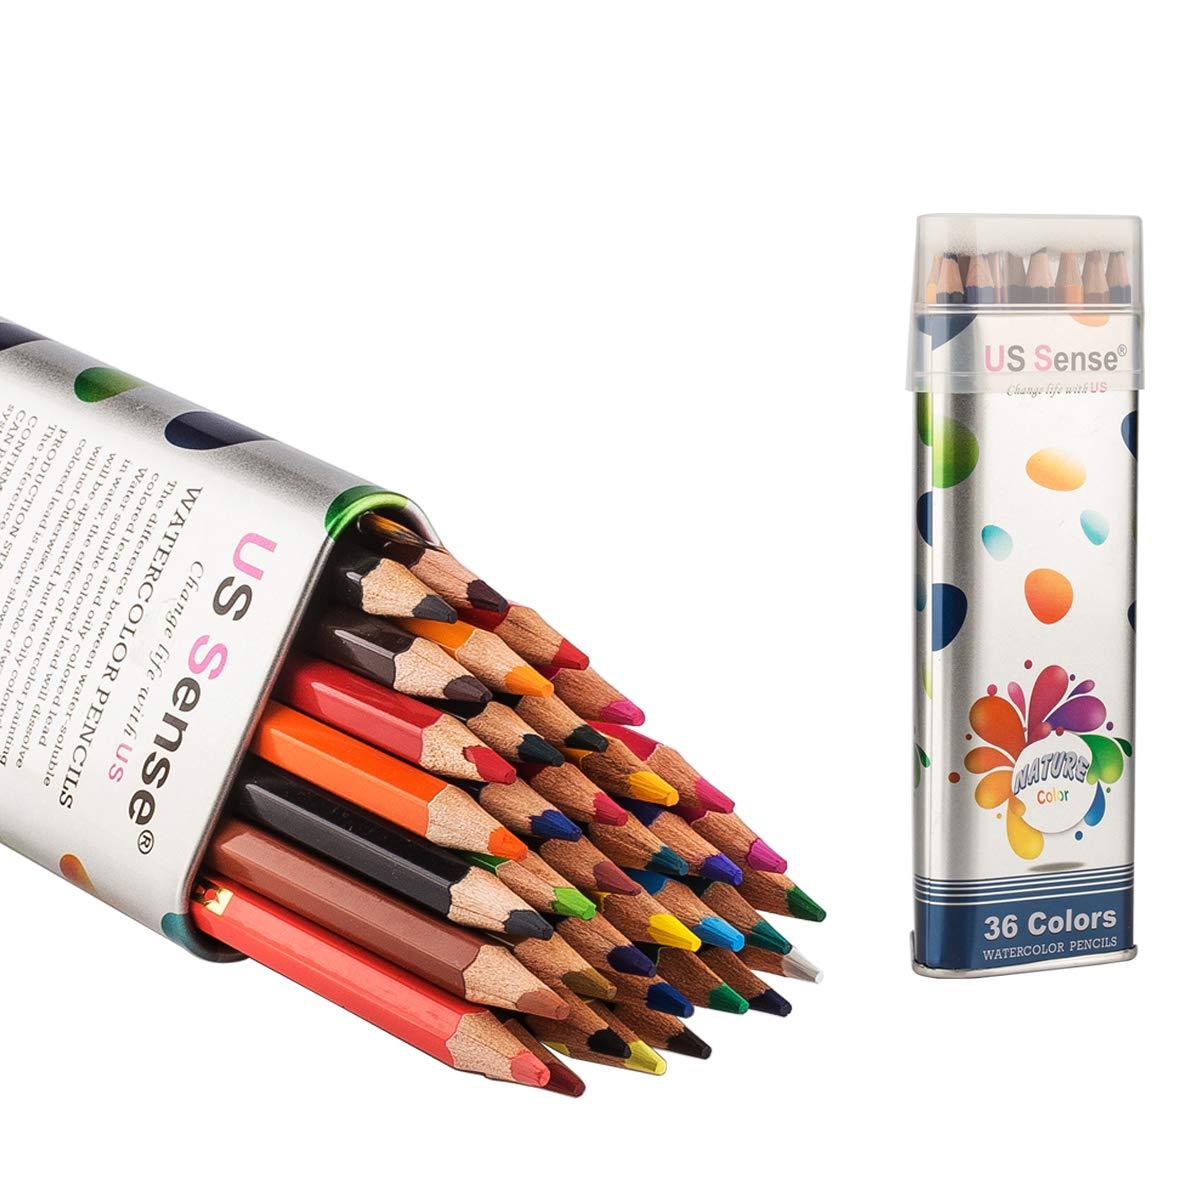 Us Sense Colored Pencils Watercolor Coloring Pencils 36 Art Supplies - Premium-color-pencils